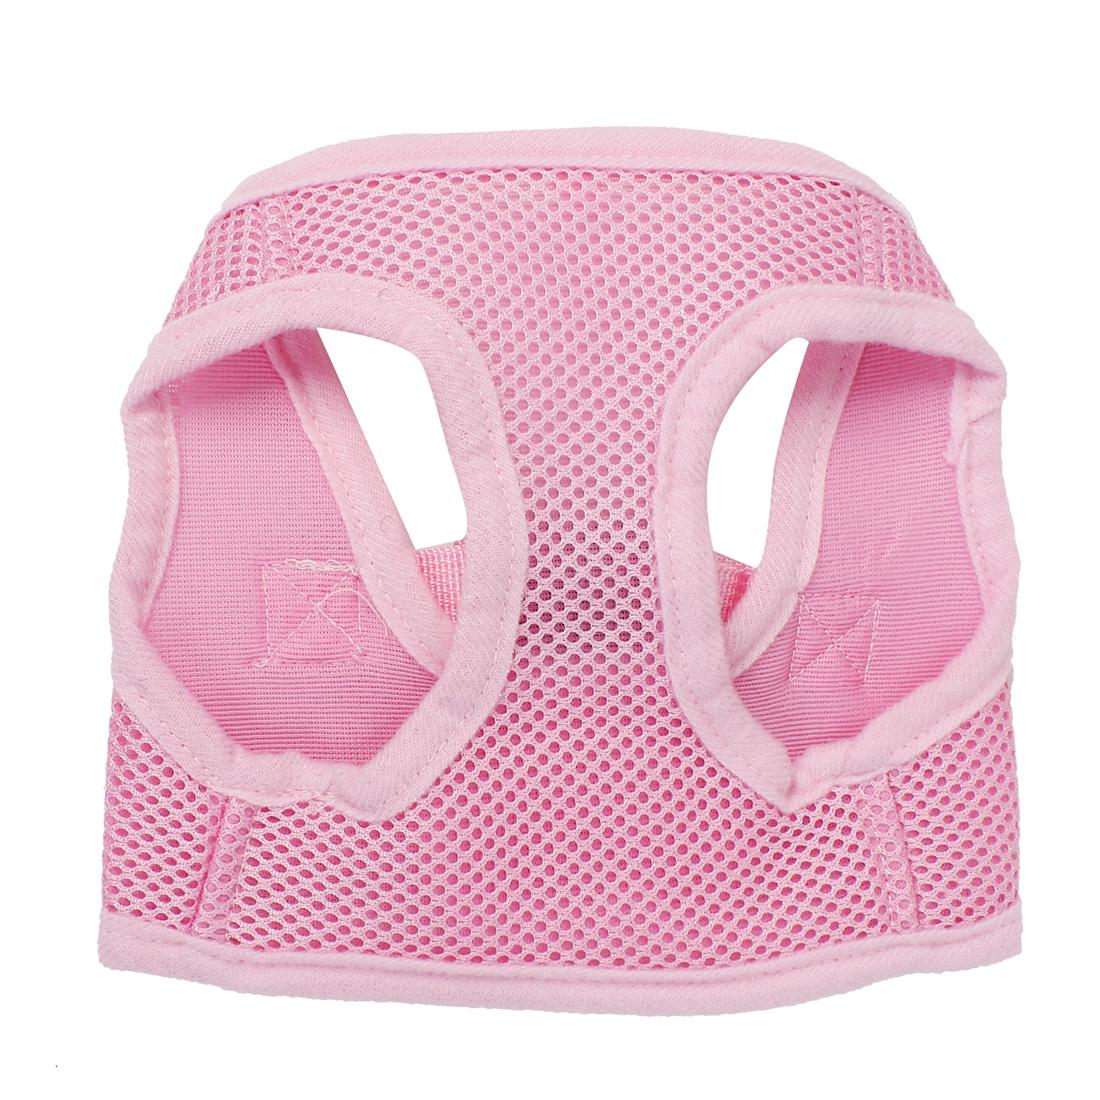 Pet Puppy Dog Adjustable Side Release Buckle Mesh Harness Vest Pink Size XS